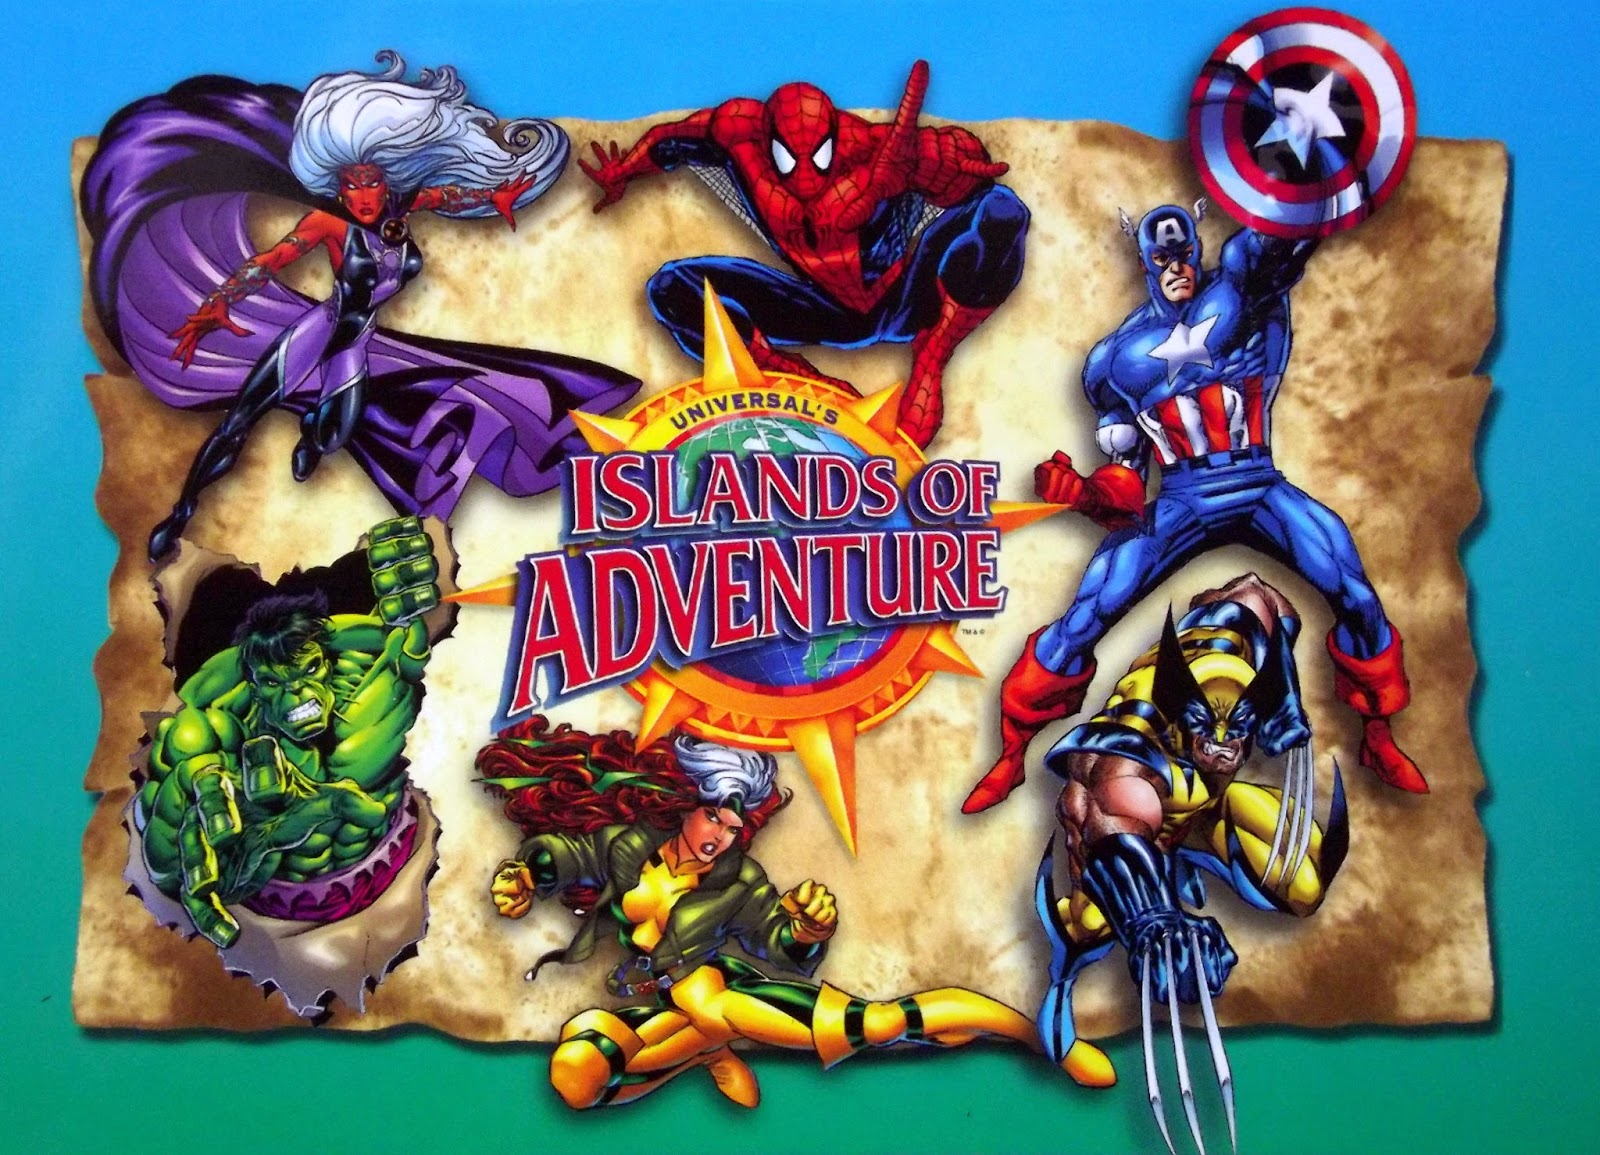 Universal Studios Islands of Adventure with pictures of Marvel superheroes